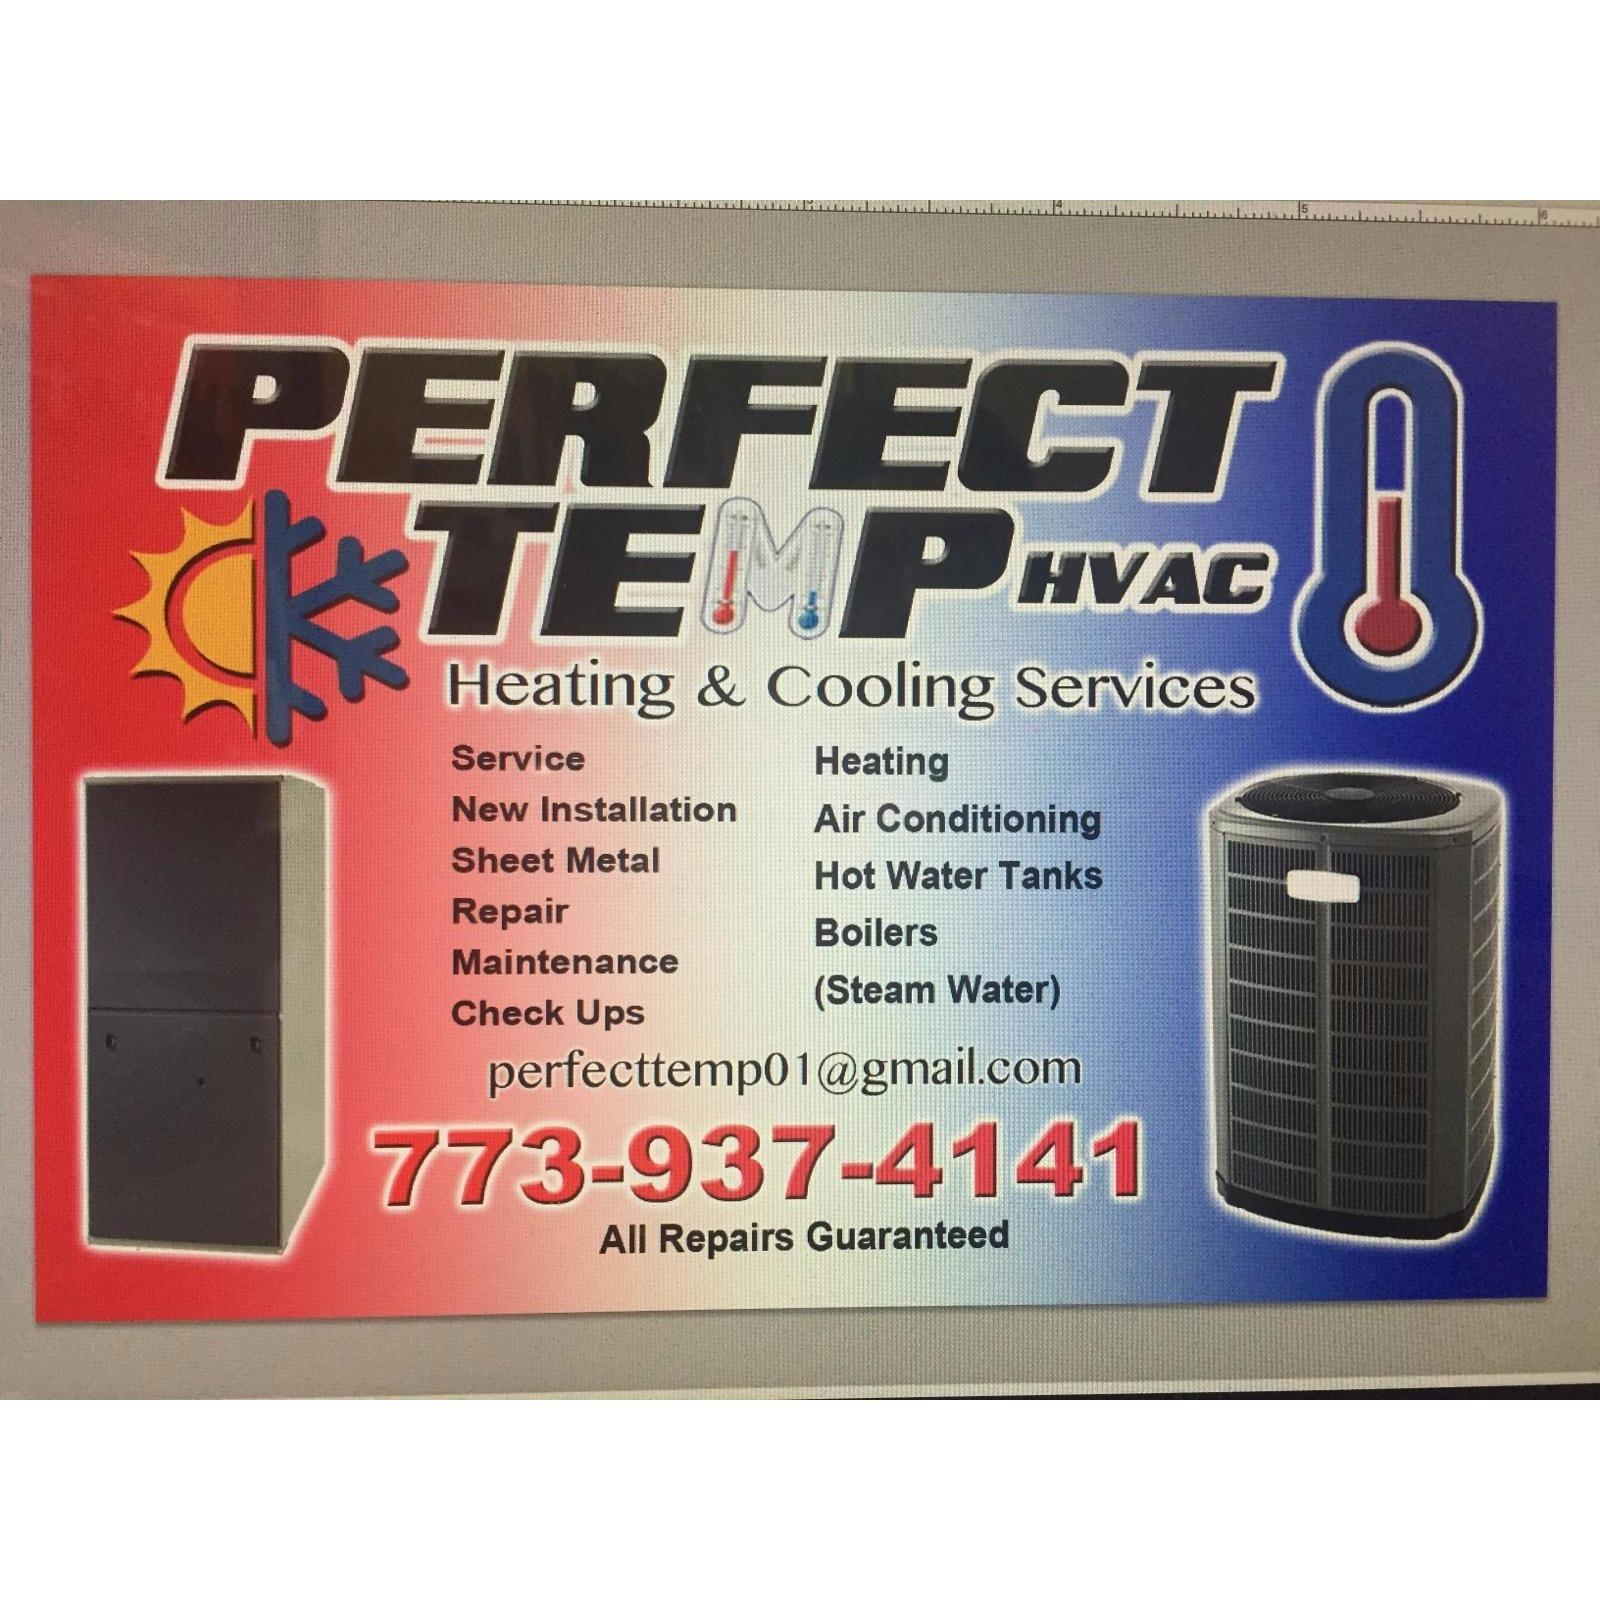 Perfect Temp HVAC LLC